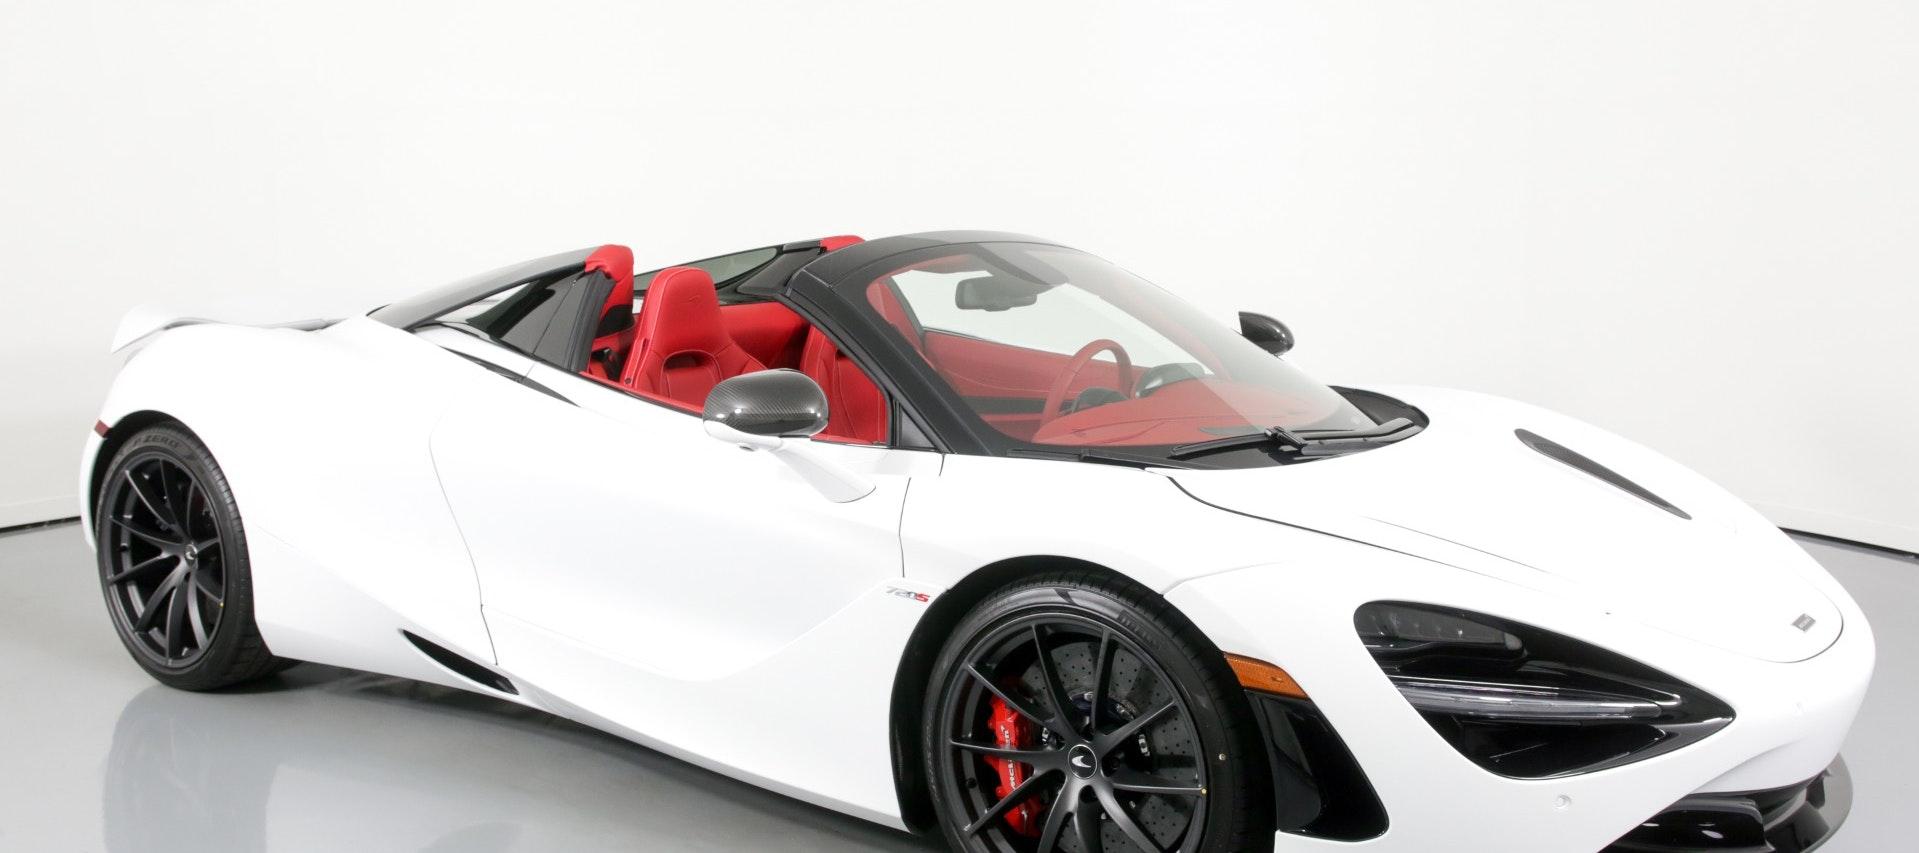 2020 McLaren 720s Spider for rent in Miami